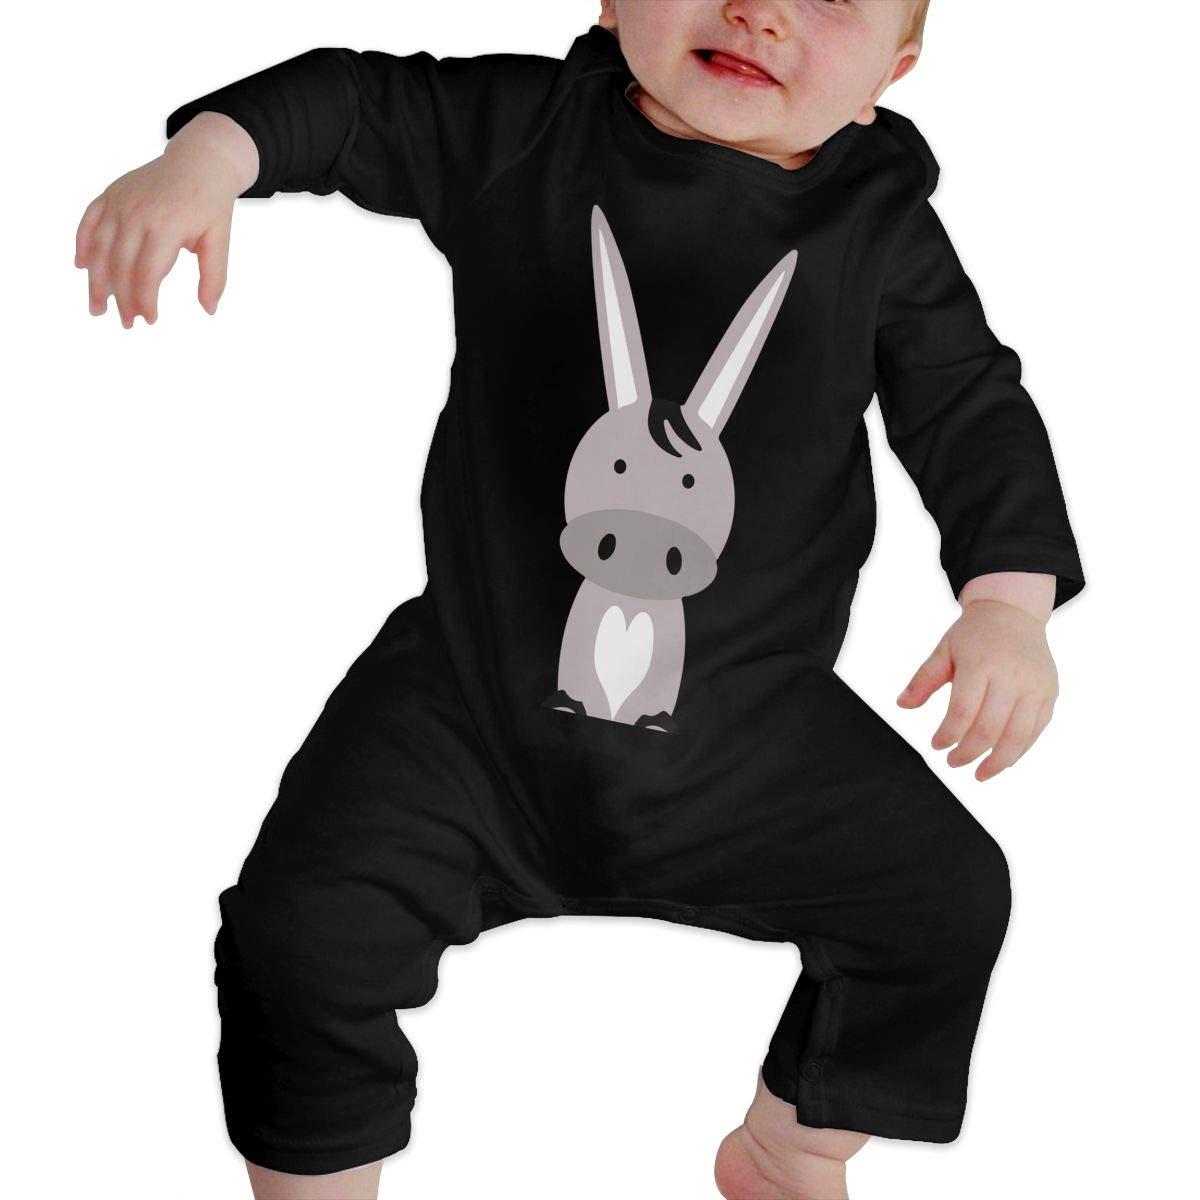 Donkey Baby Girl Long Sleeve Romper Jumpsuit Toddler Jumpsuit Farm Animals